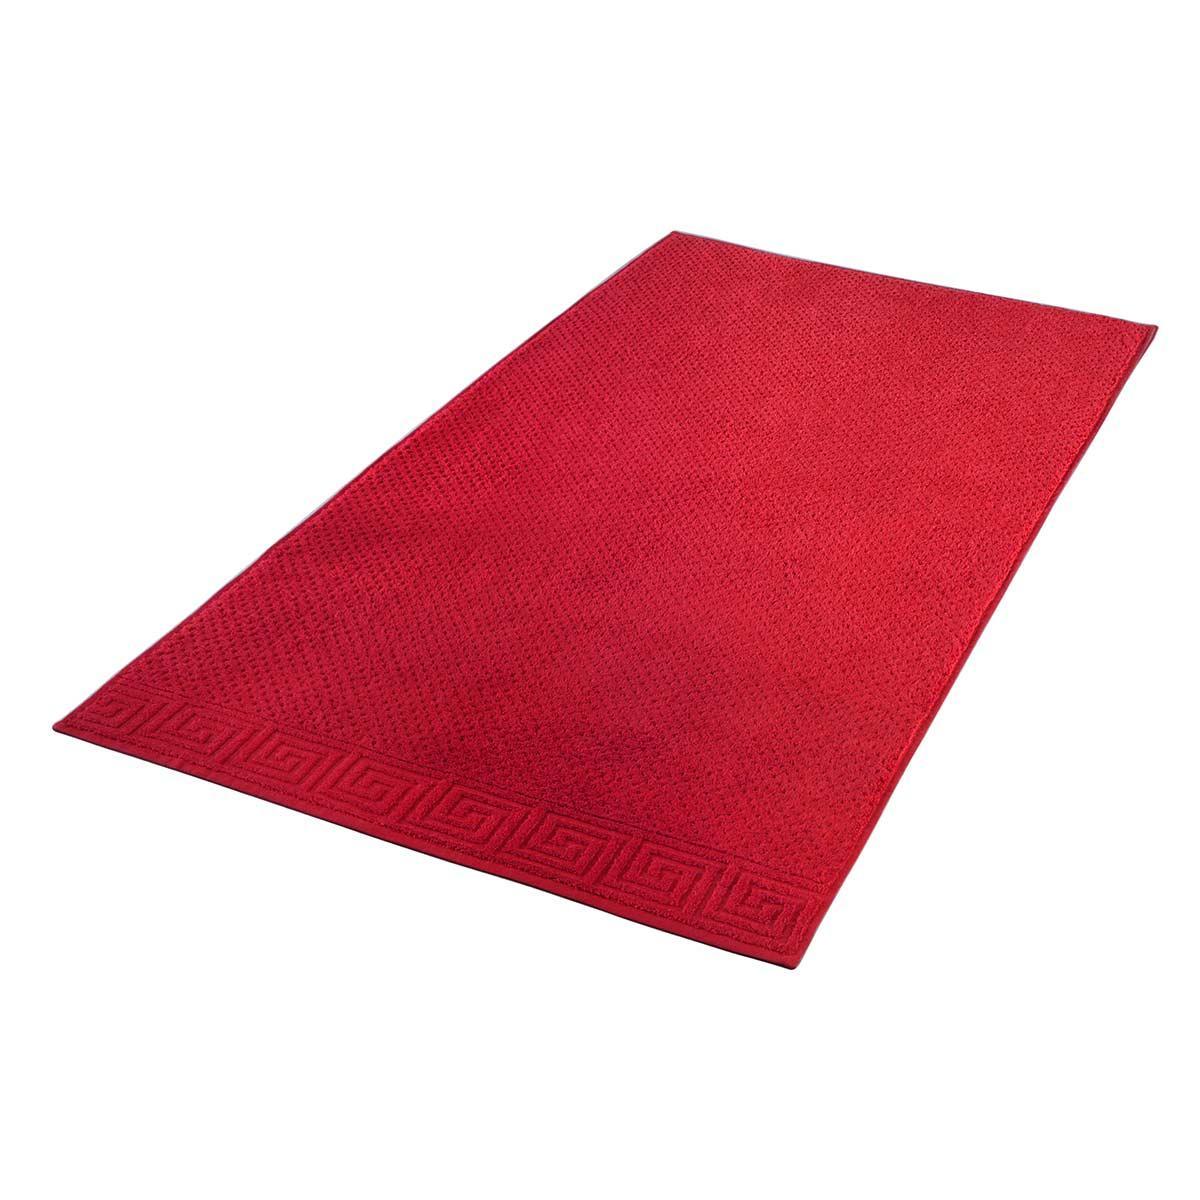 Полотенце Arya Жаккард 50x90 Meander (A106960) Красный